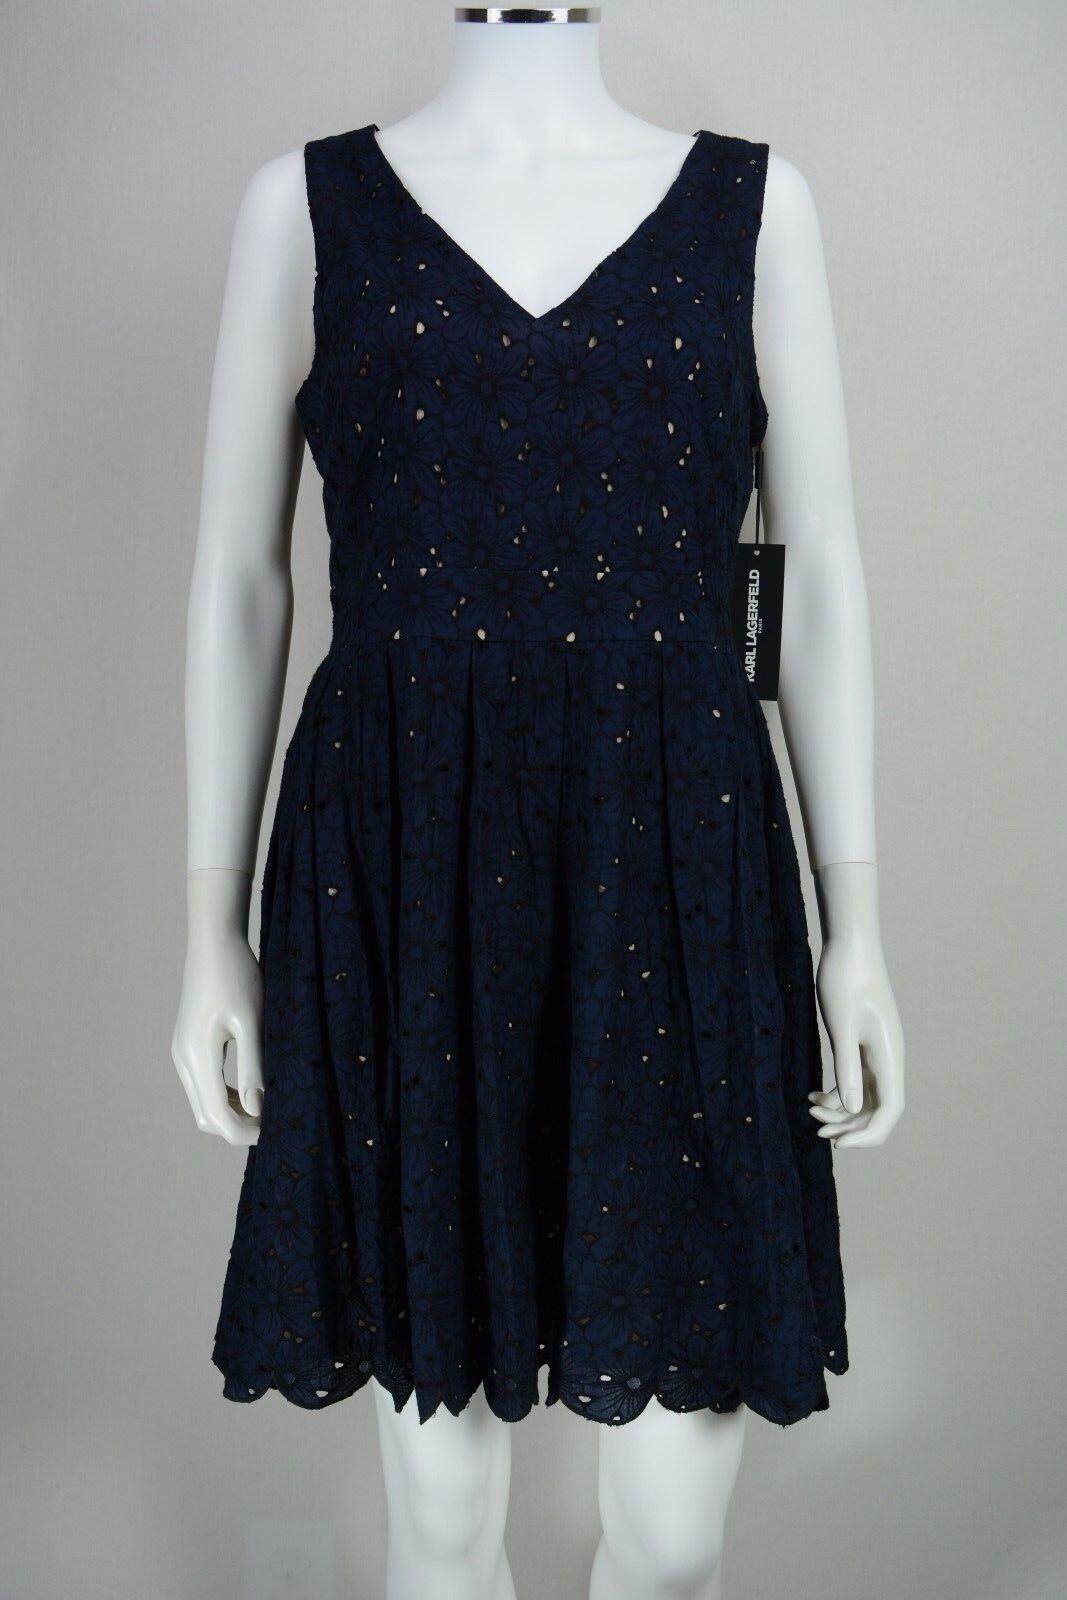 Woherren Karl Lagerfeld Größe 10 Blau Floral Lace Fit & Flare Tea Dress NEW NWT